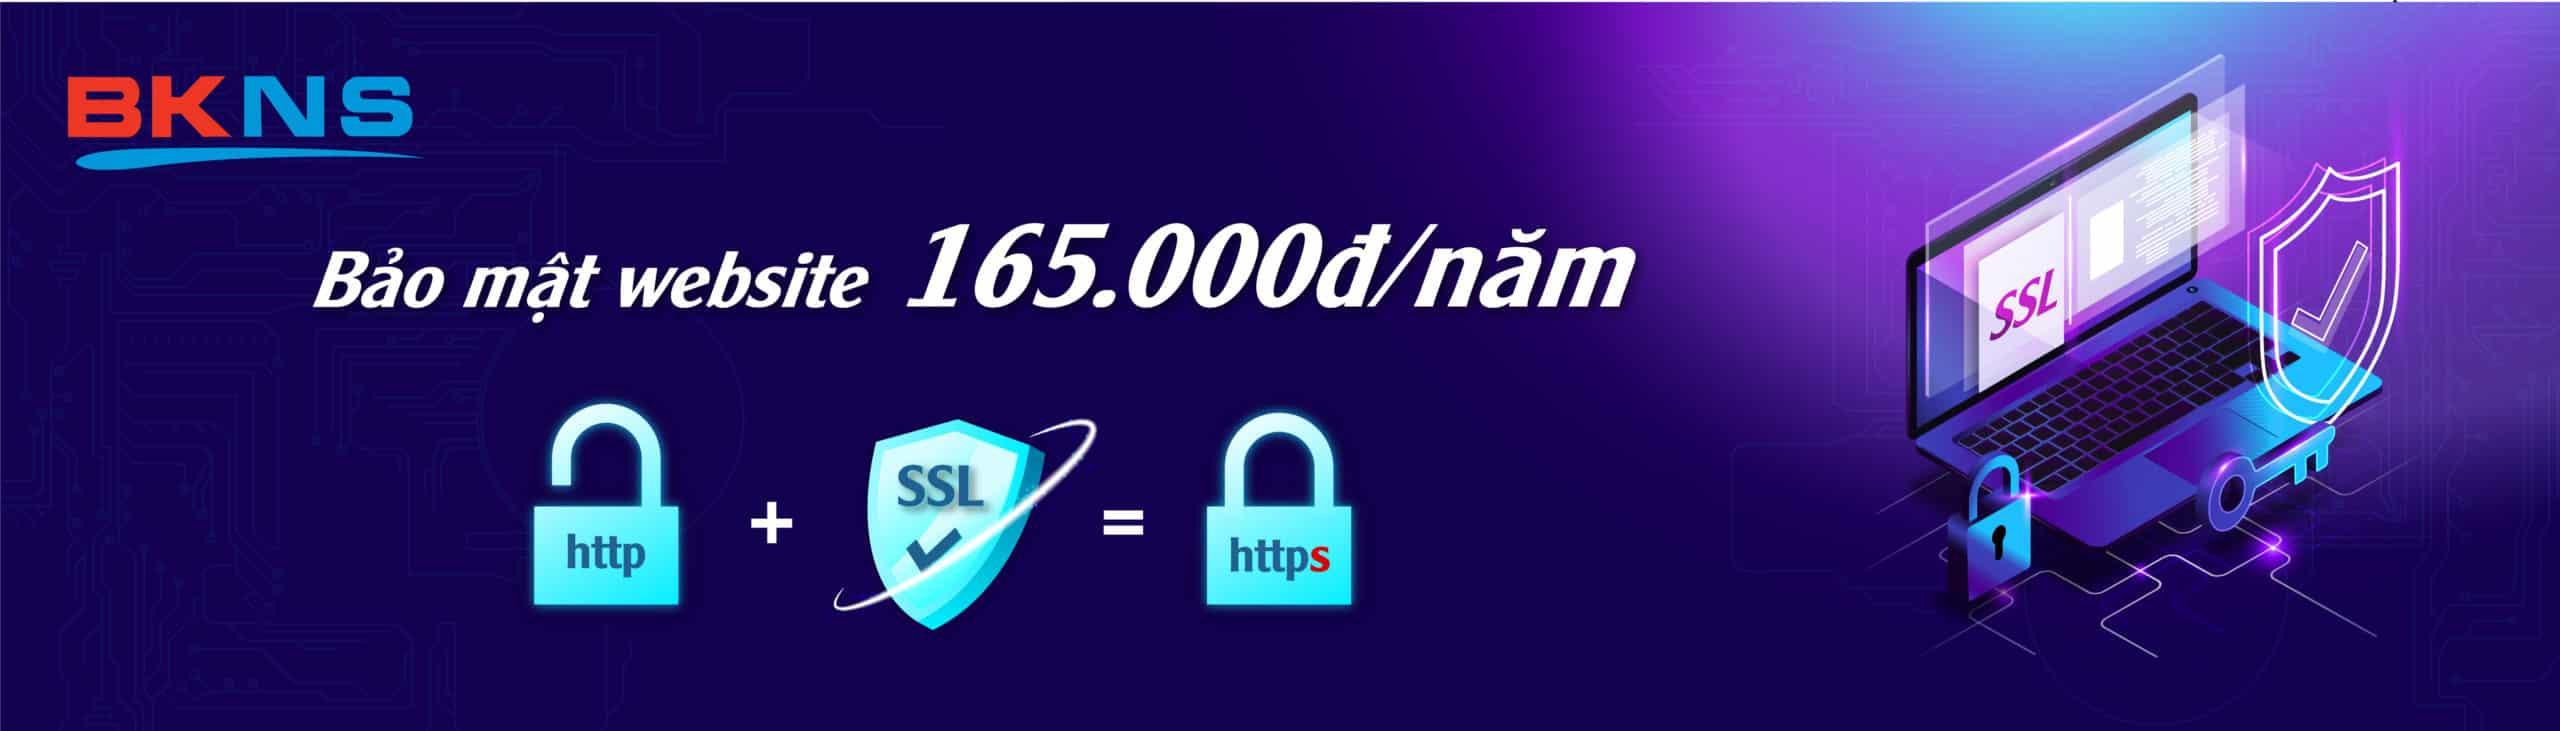 Khuyến mại bảo mật website